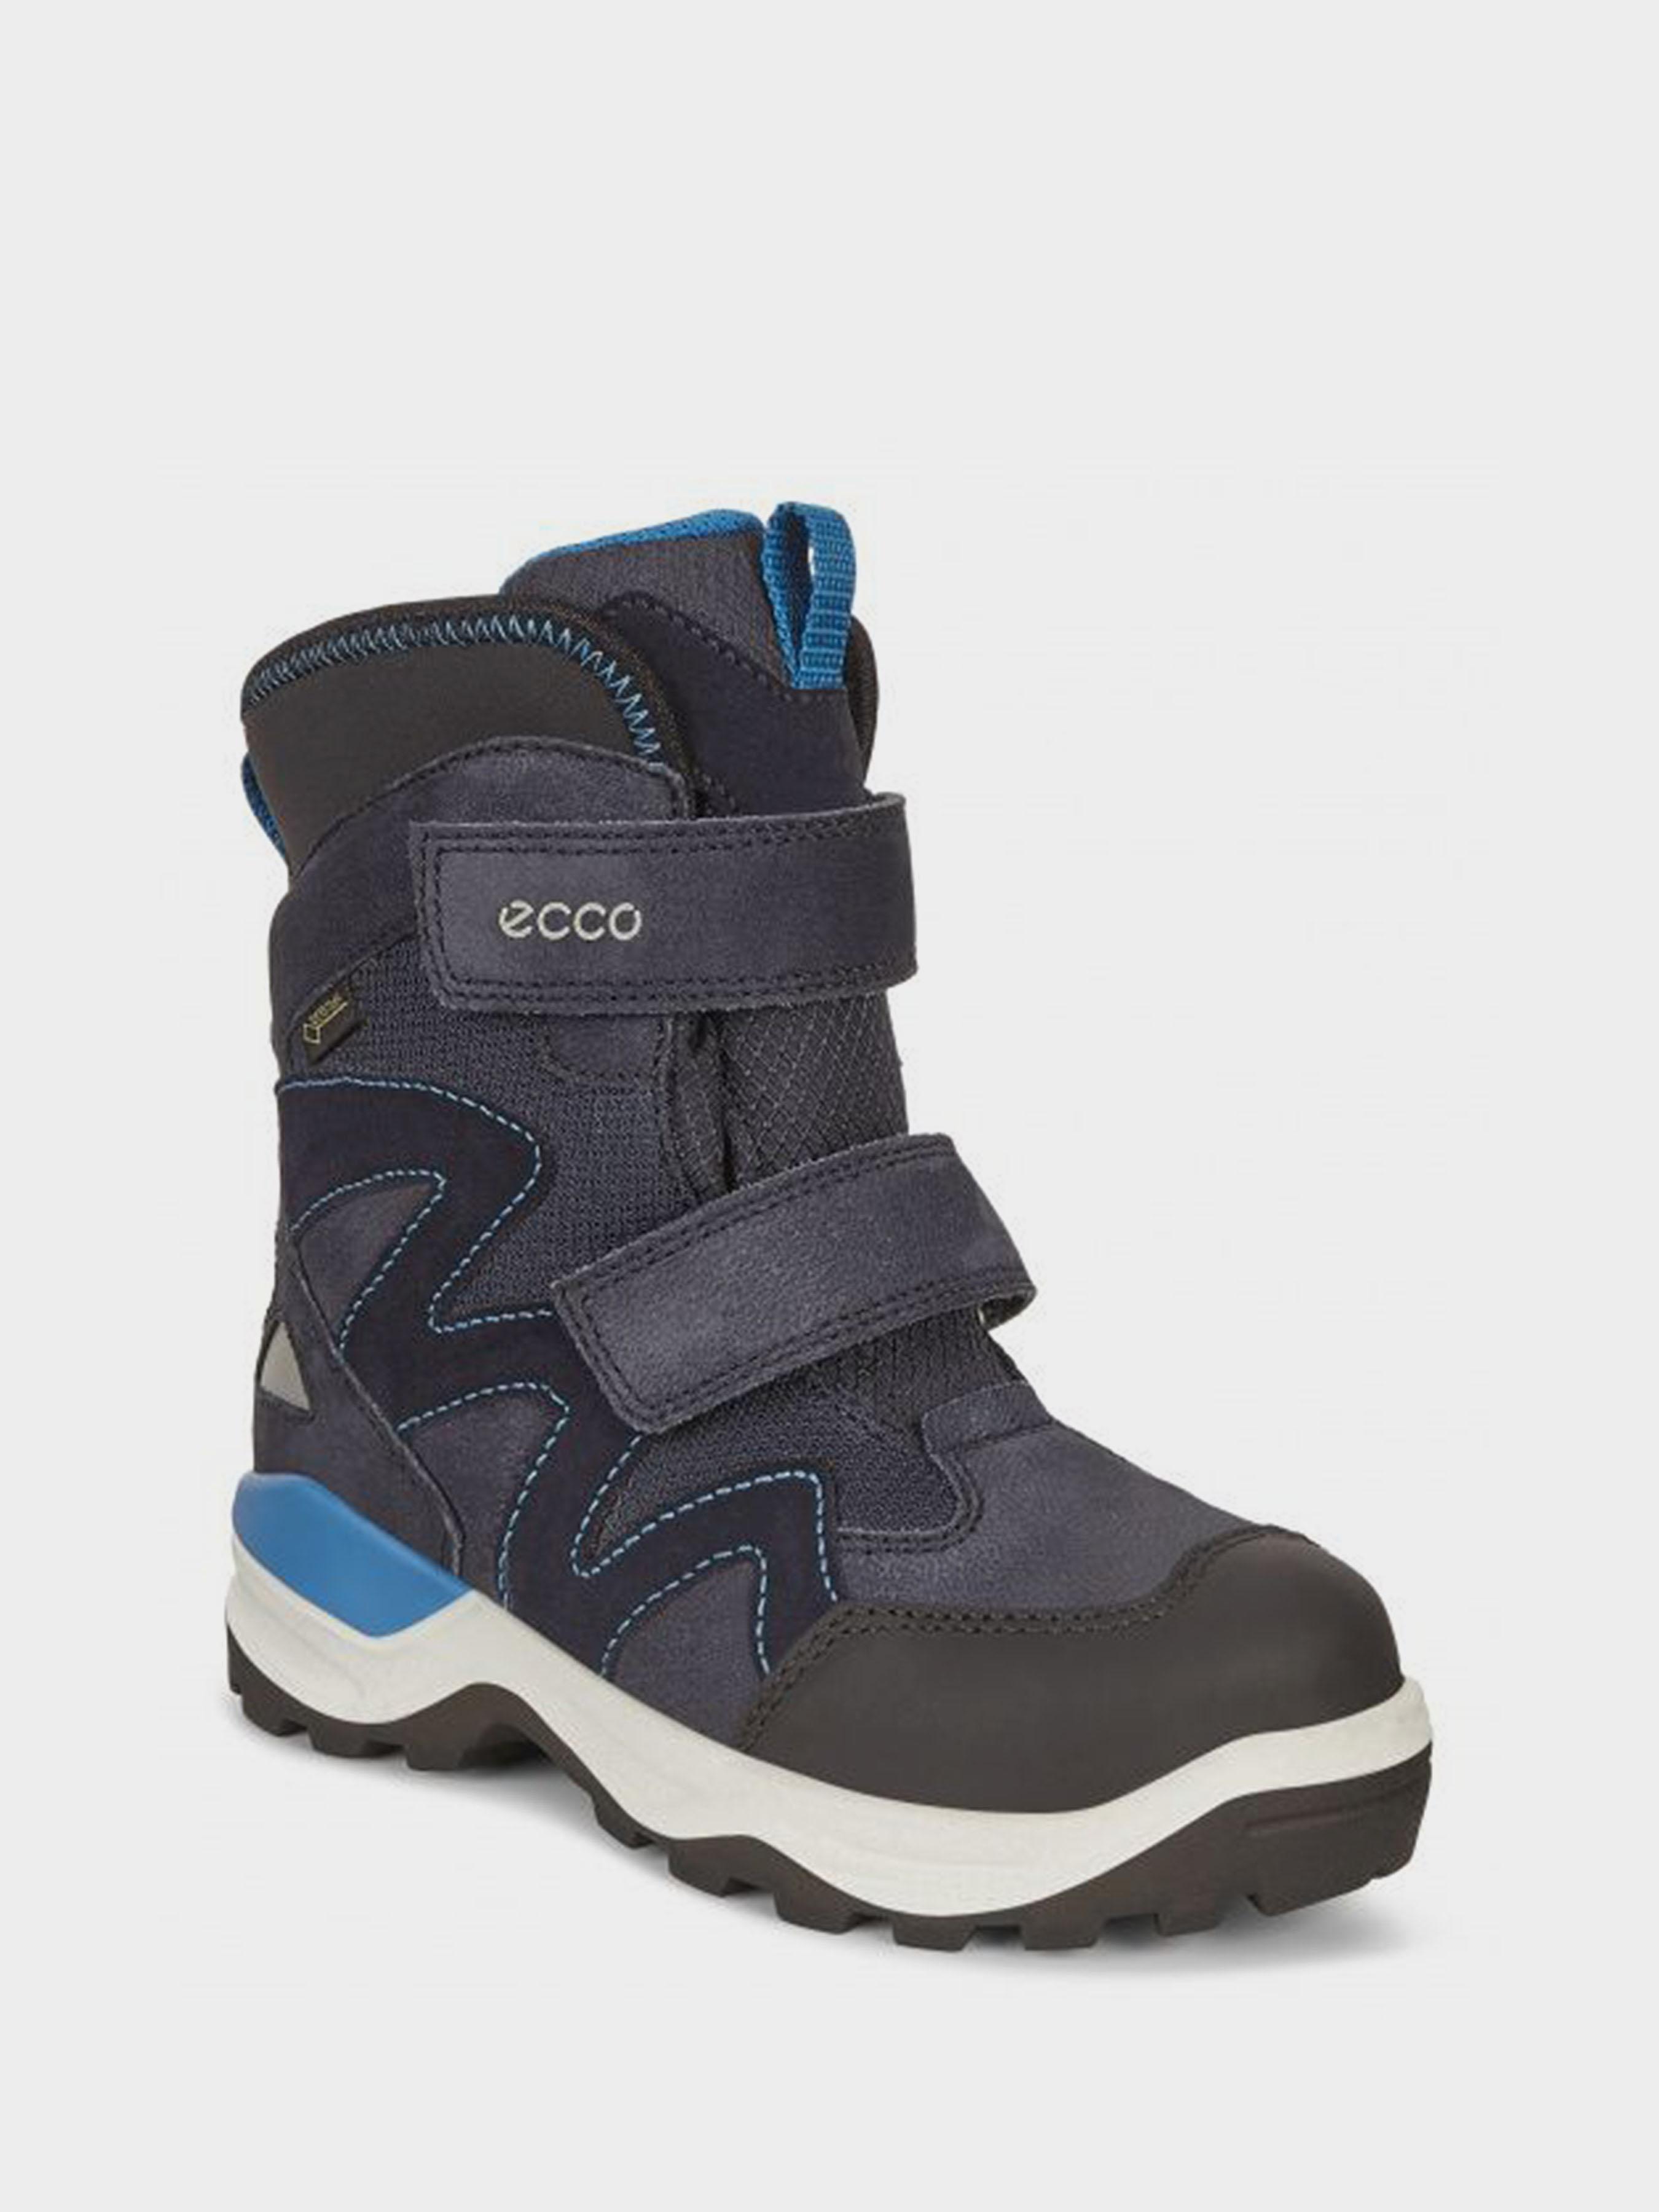 Купить Сапоги детские ECCO SNOW MOUNTAIN ZK3305, Синий